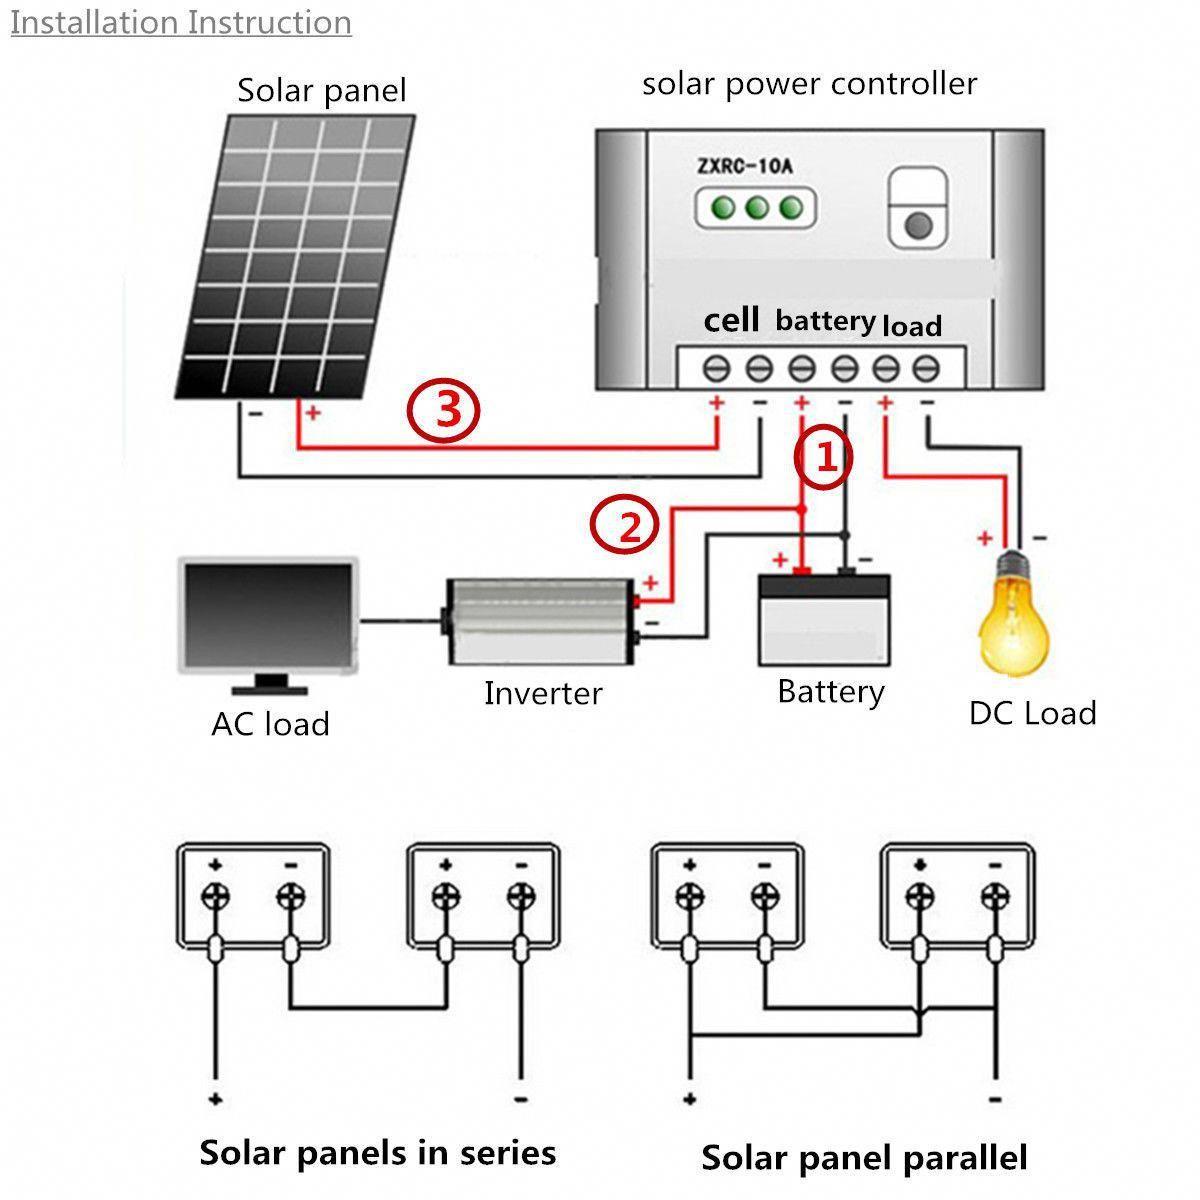 100w 18v Sunpower Semi Flexible Solar Panel Battery Charger For Boat Caravan 928857643549 Ebay Solare Flexible Solar Panels Solar Panels Solar Panel Battery